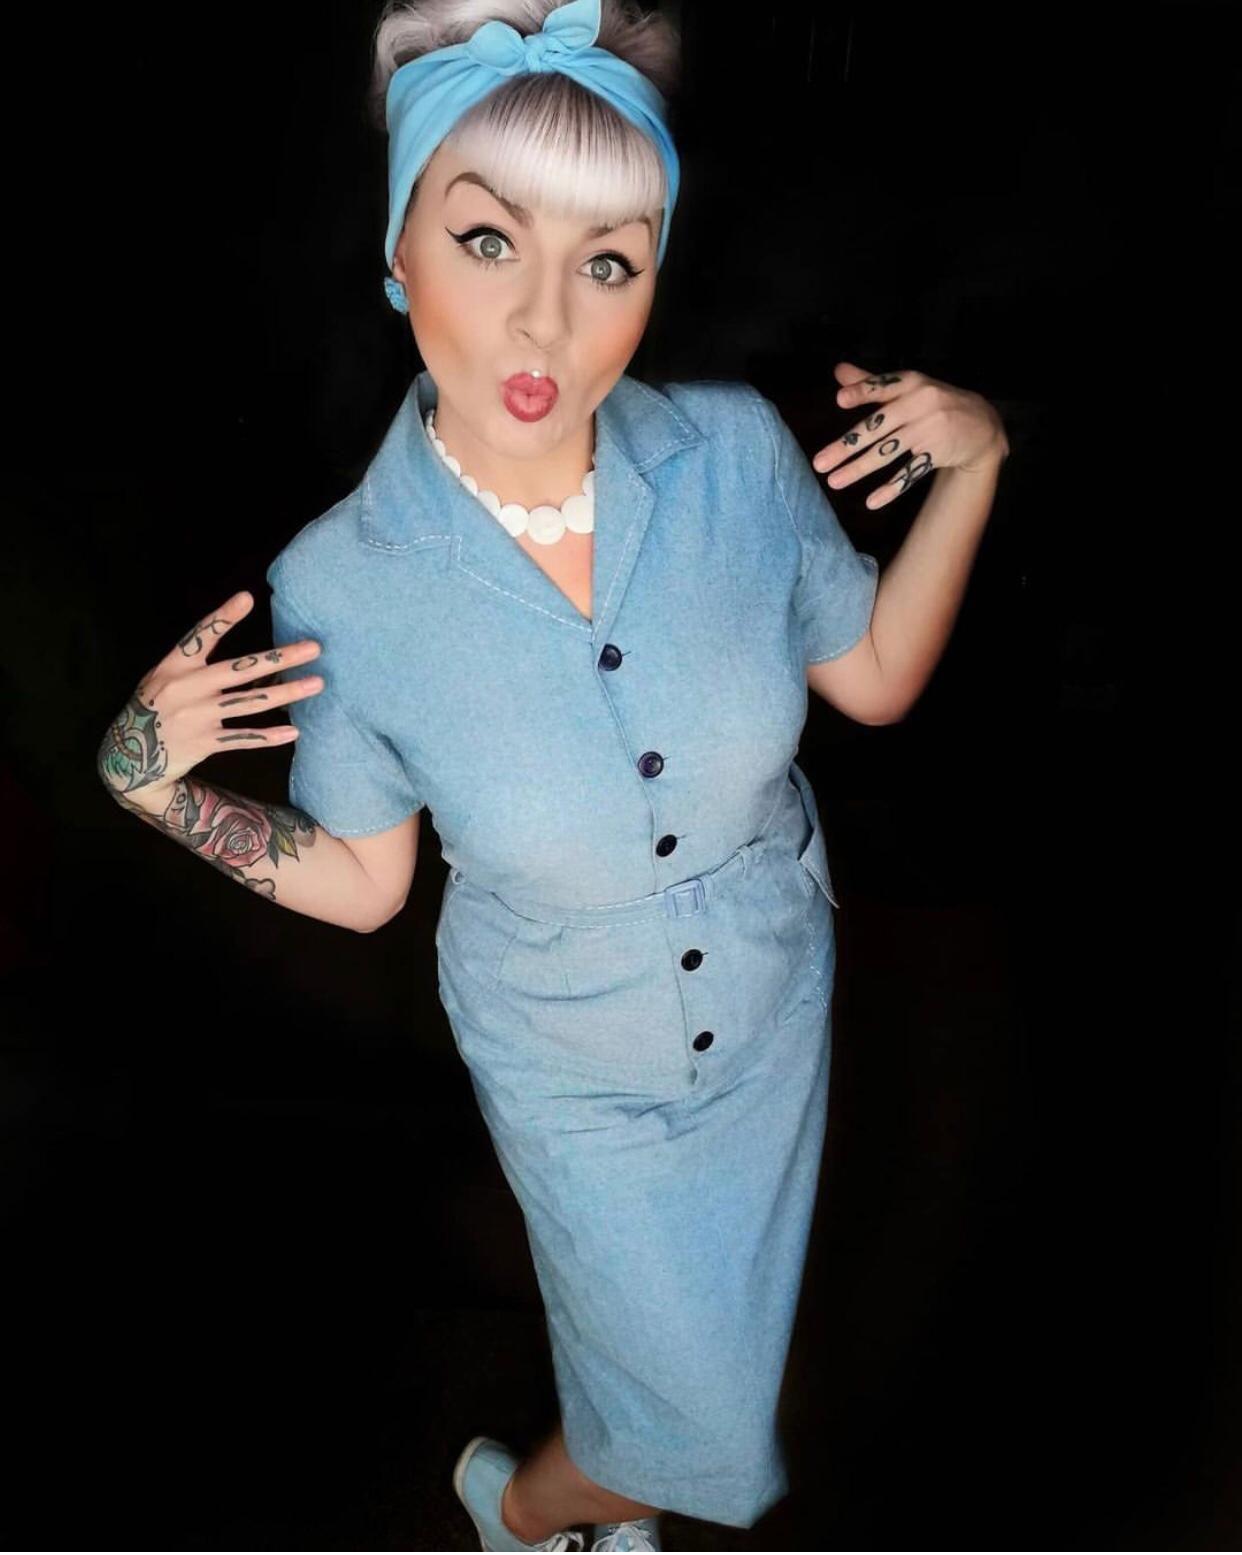 **Sample Sale** The Josie Dress in Lightweight Denim Blue Cotton Chambray, True & Authentic 1950s Vintage Style - 14